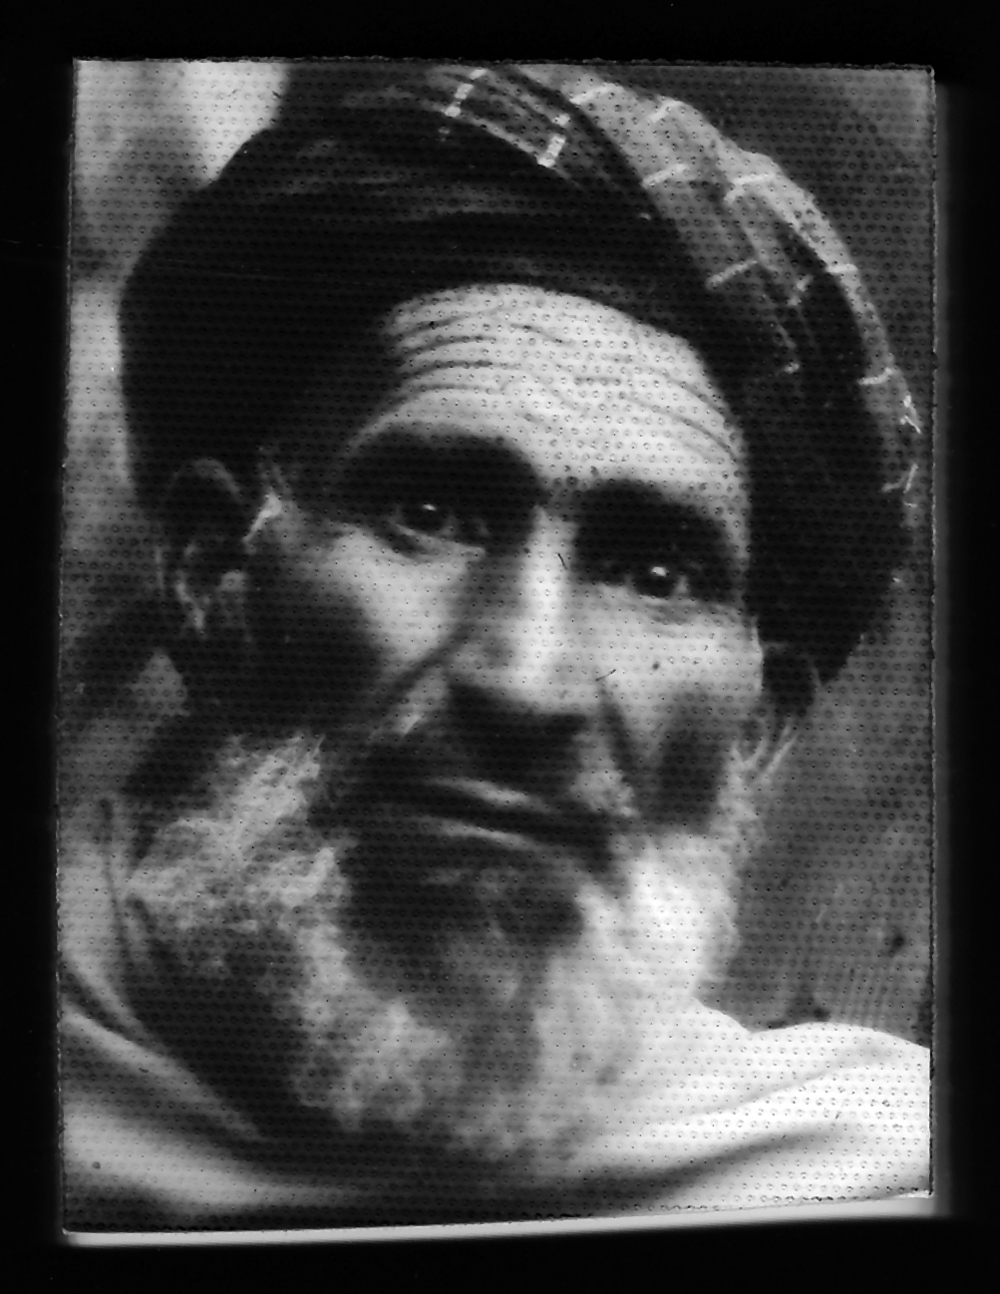 Box Camera photo by Muhammad Ishaq. Jalalabad.